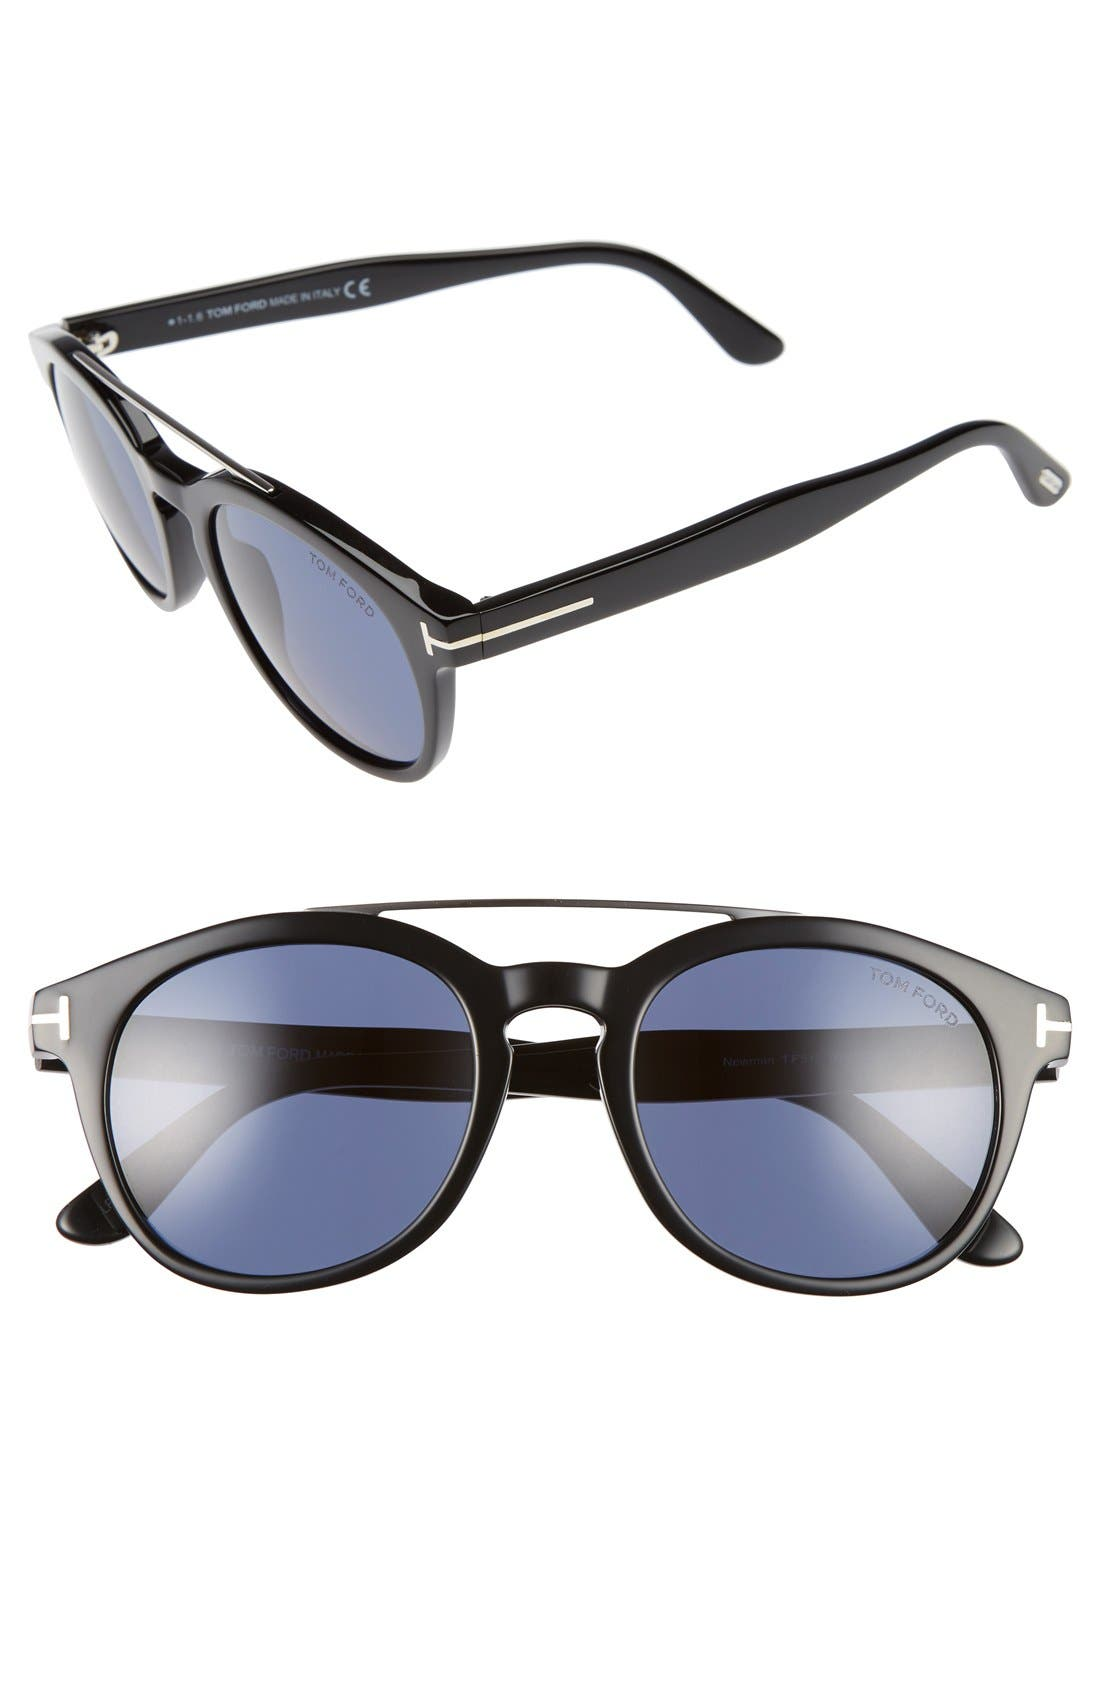 Main Image - Tom Ford Newman 53mm Sunglasses